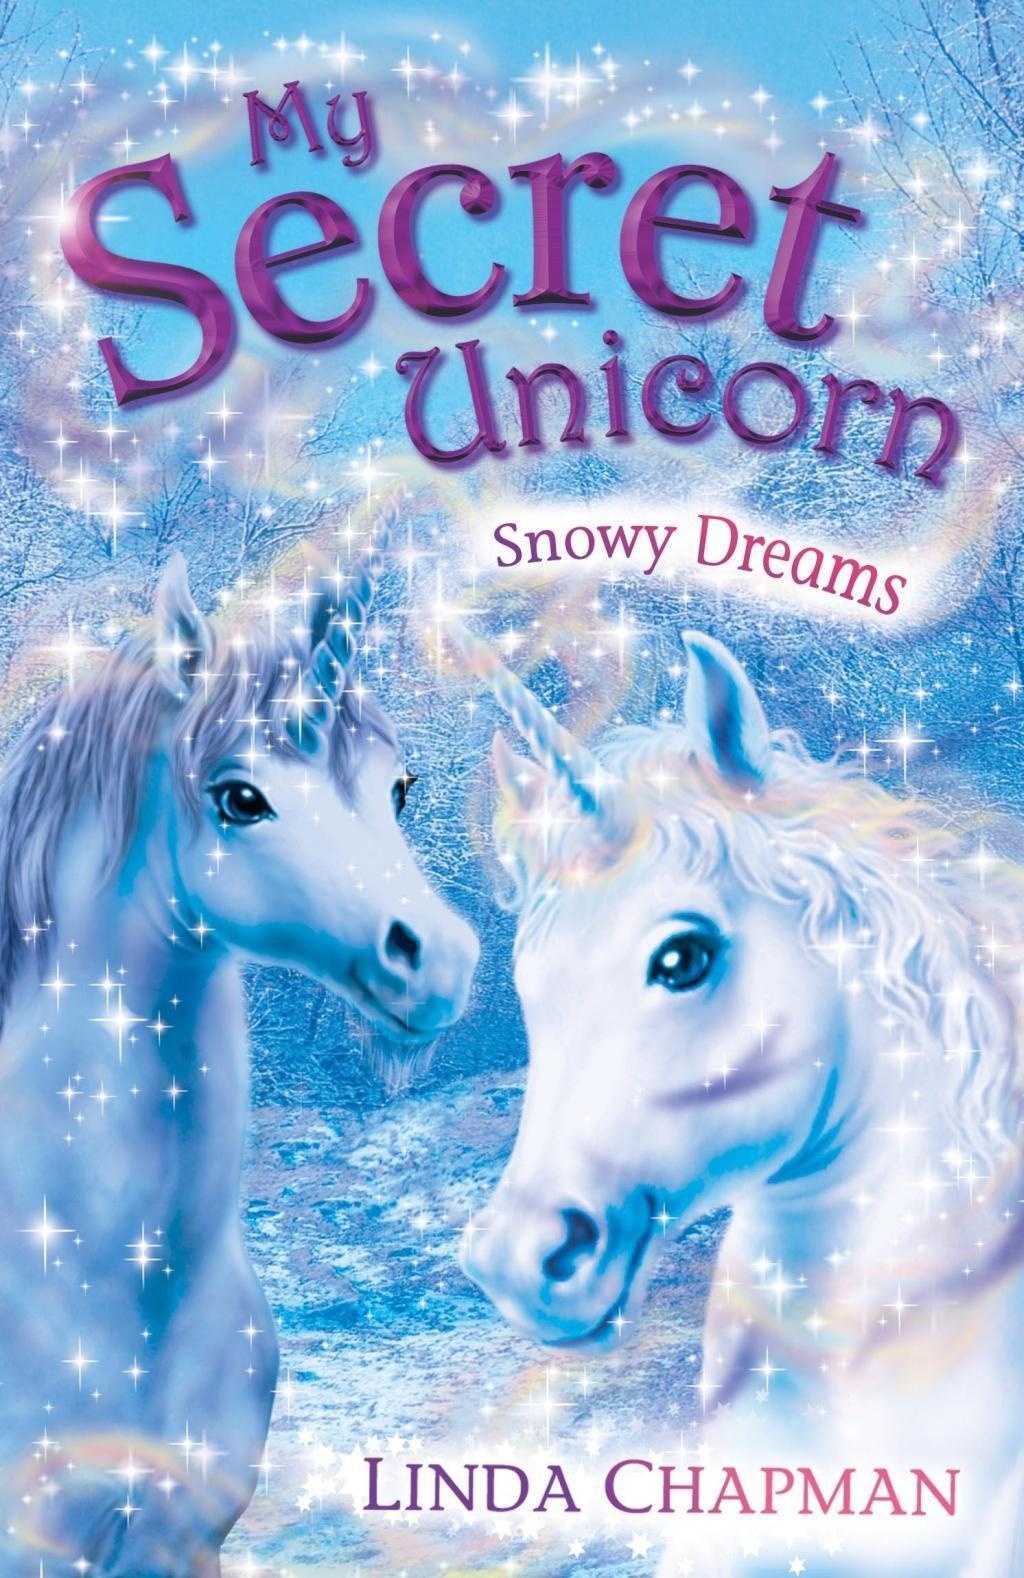 My Secret Unicorn: Snowy Dreams